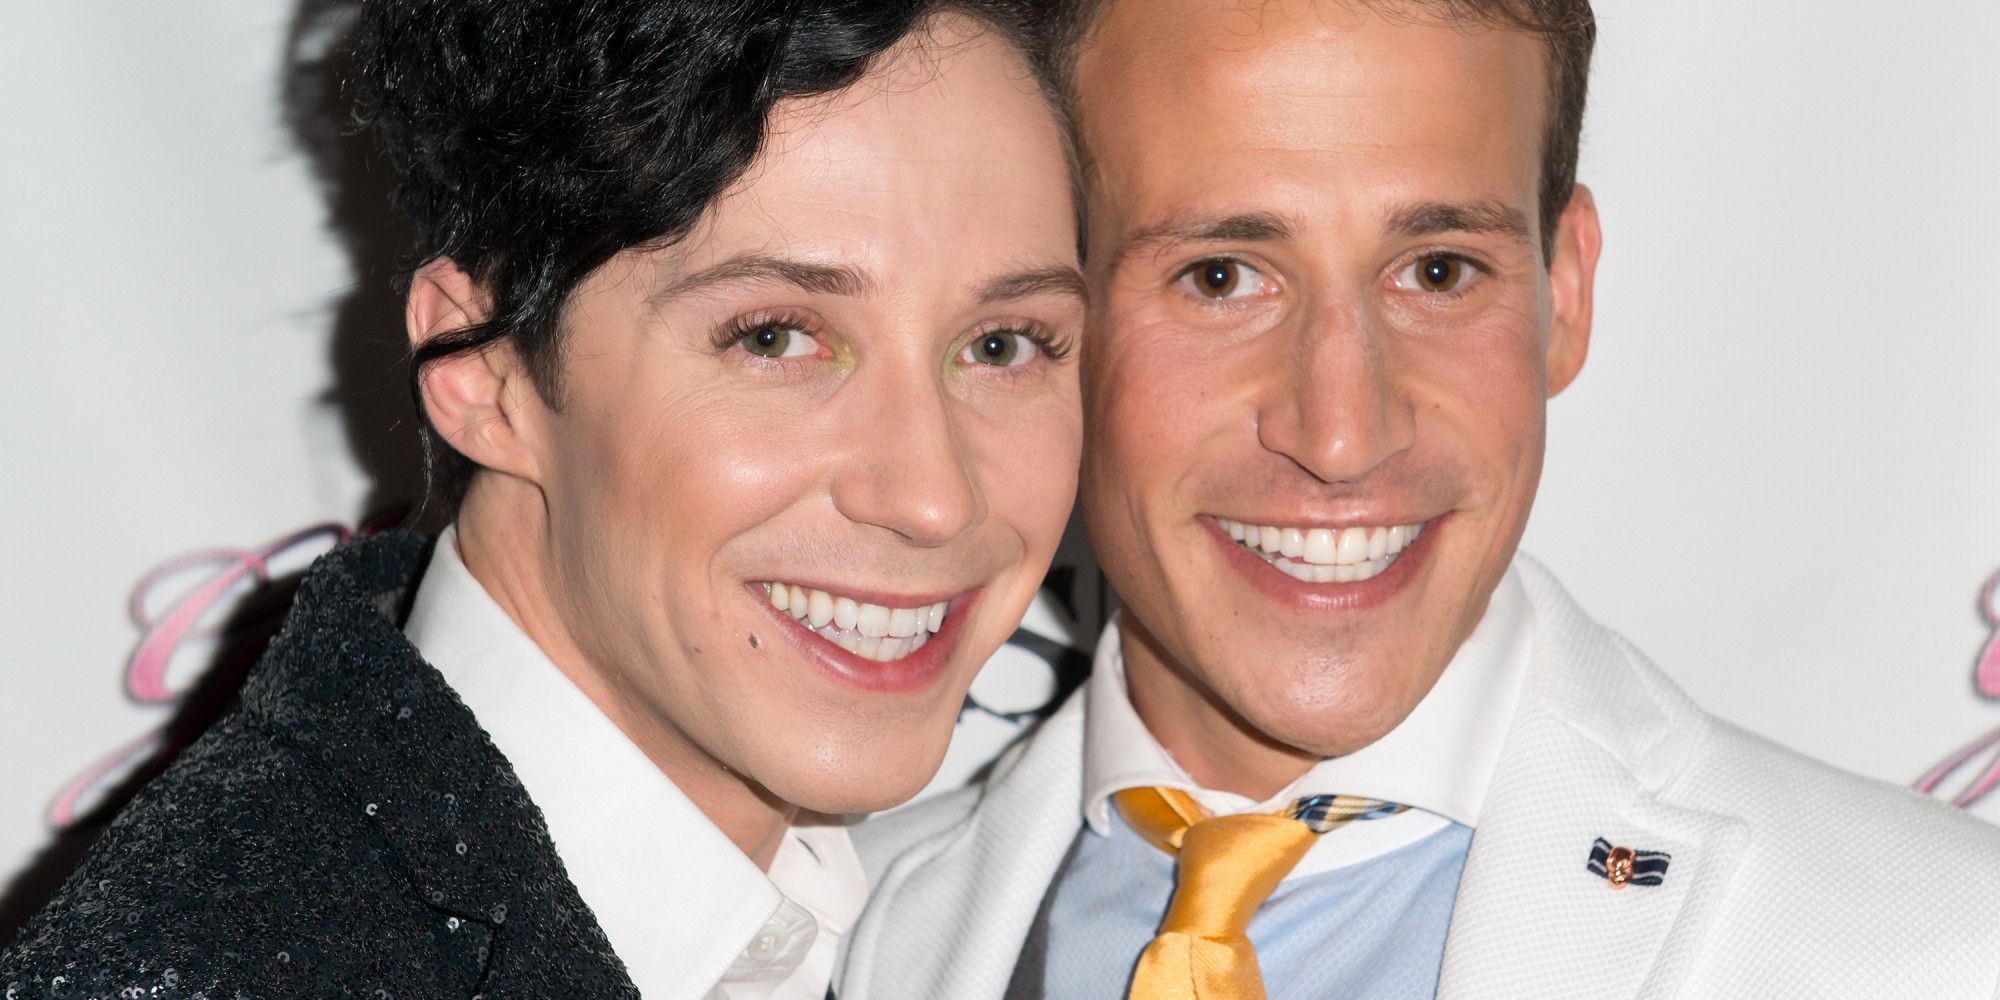 from Kashton divorce husband closeted gay